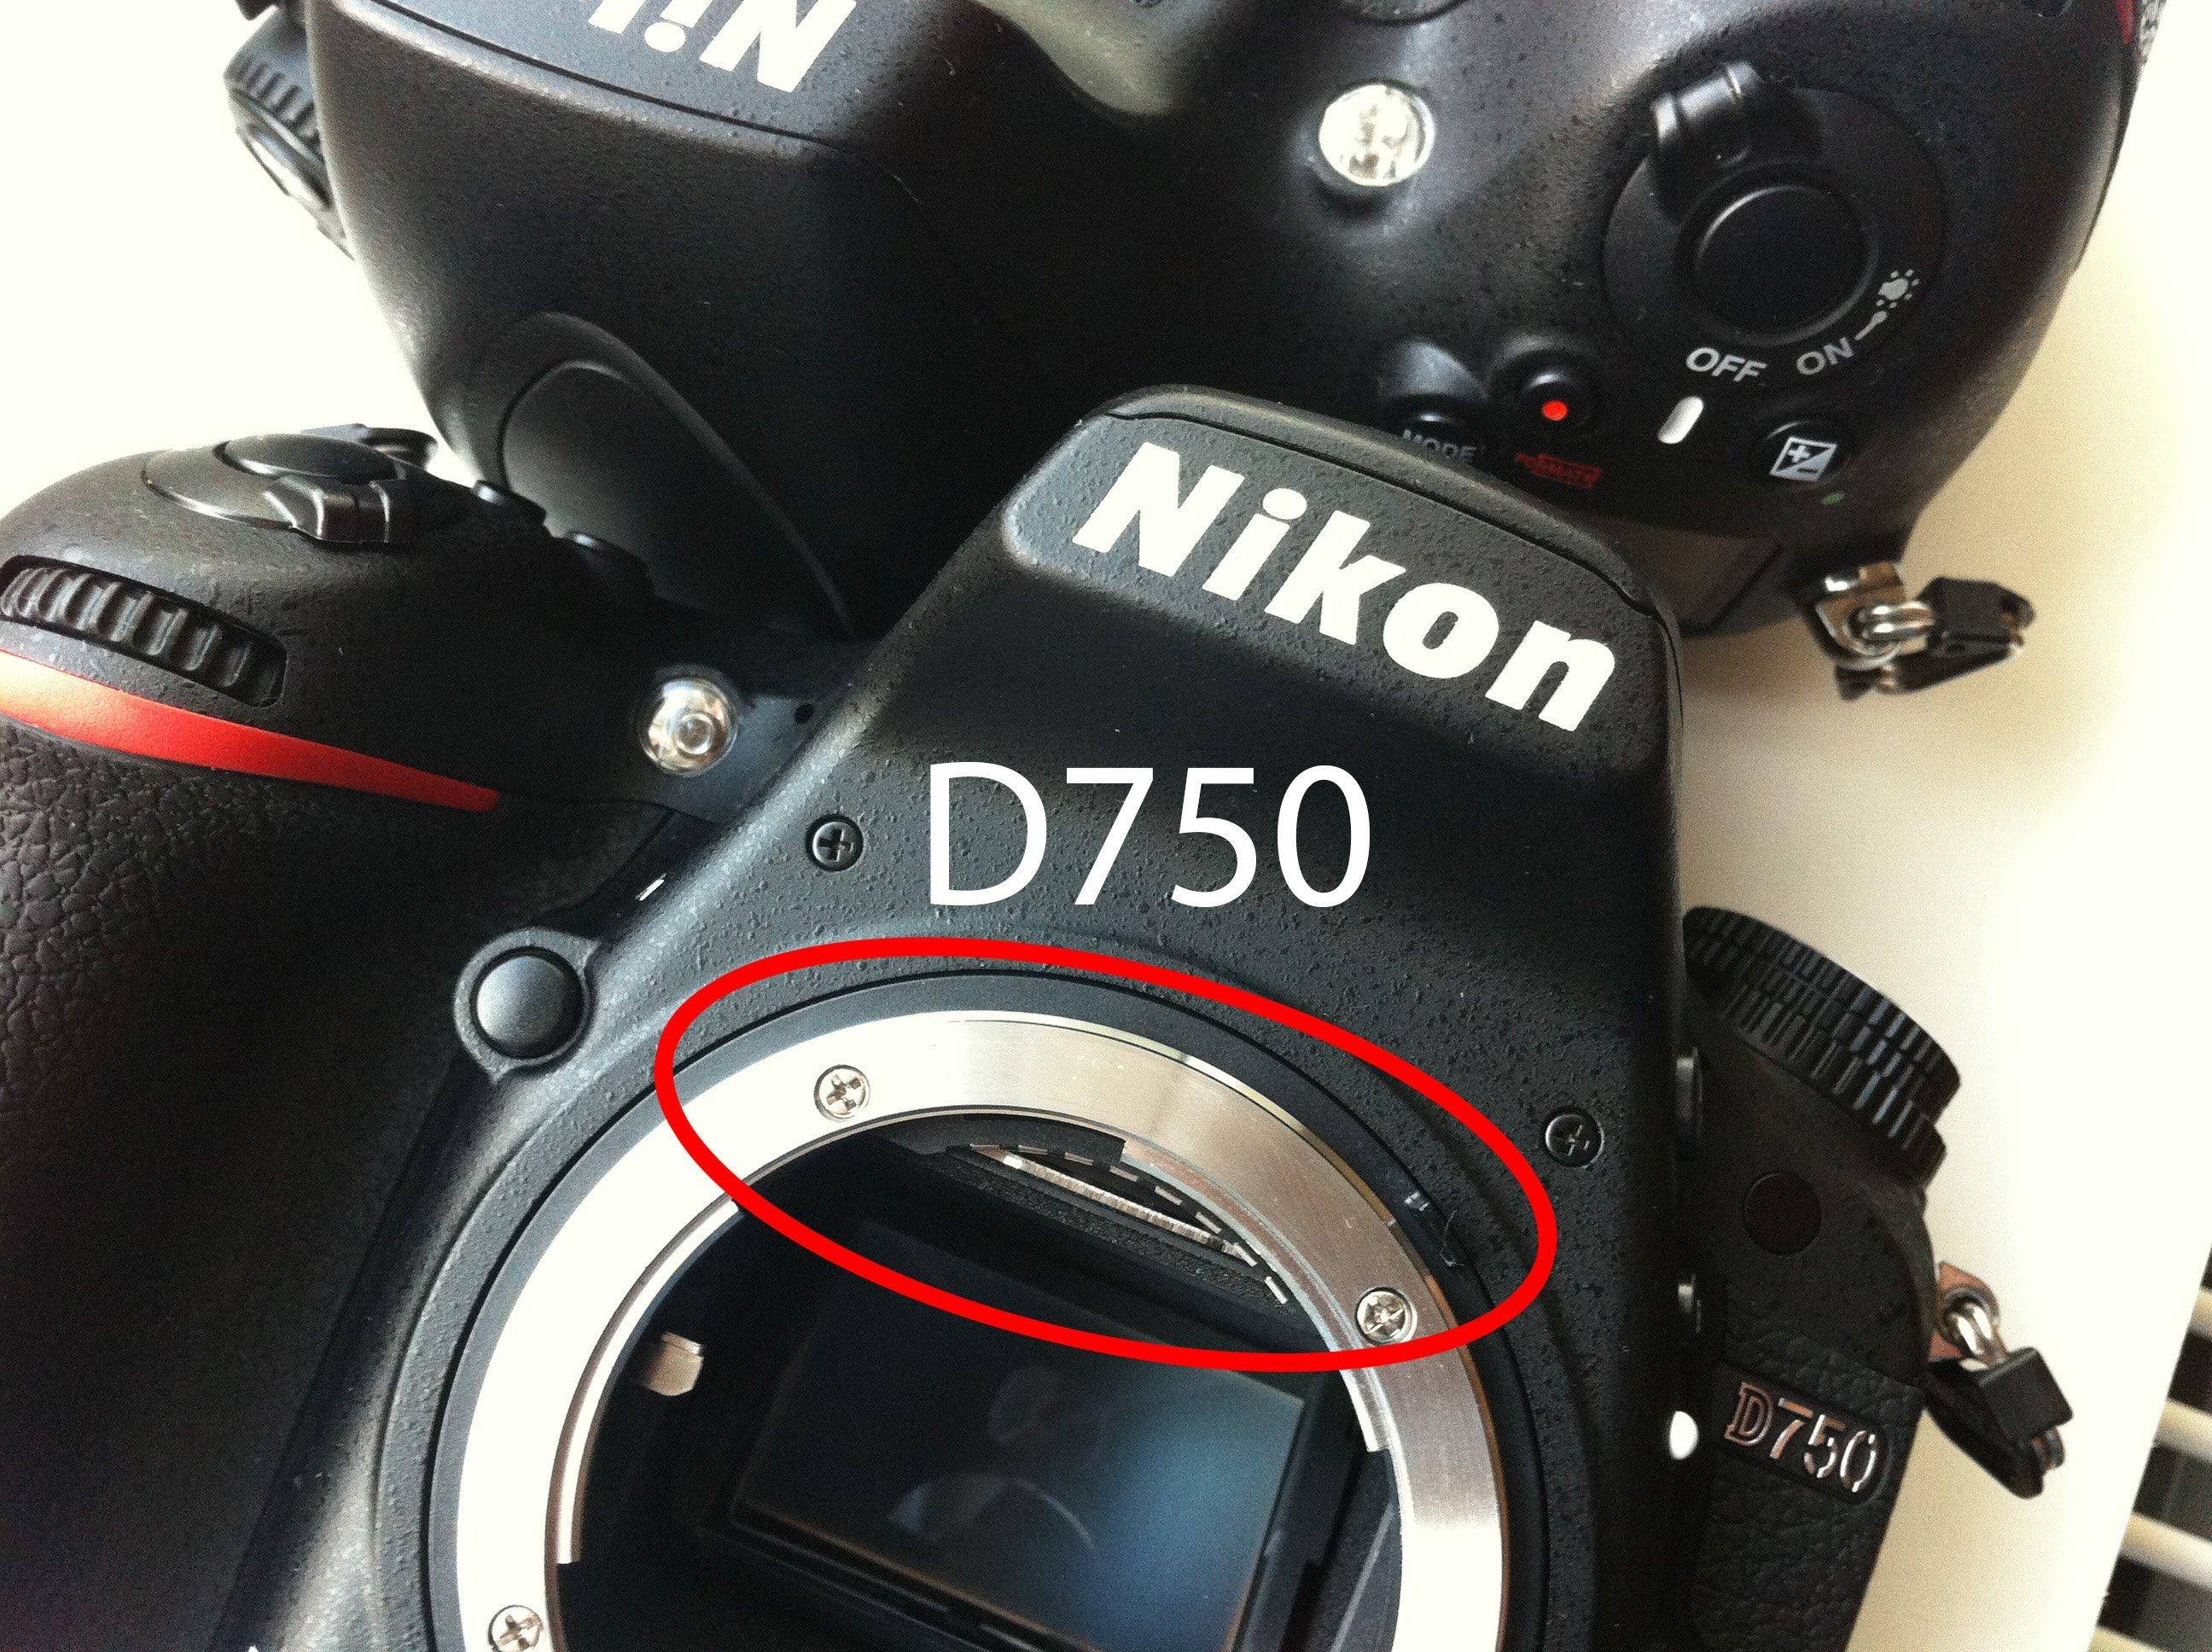 Re: Nikon D750 internal reflection issue?: Nikon FX SLR (DF